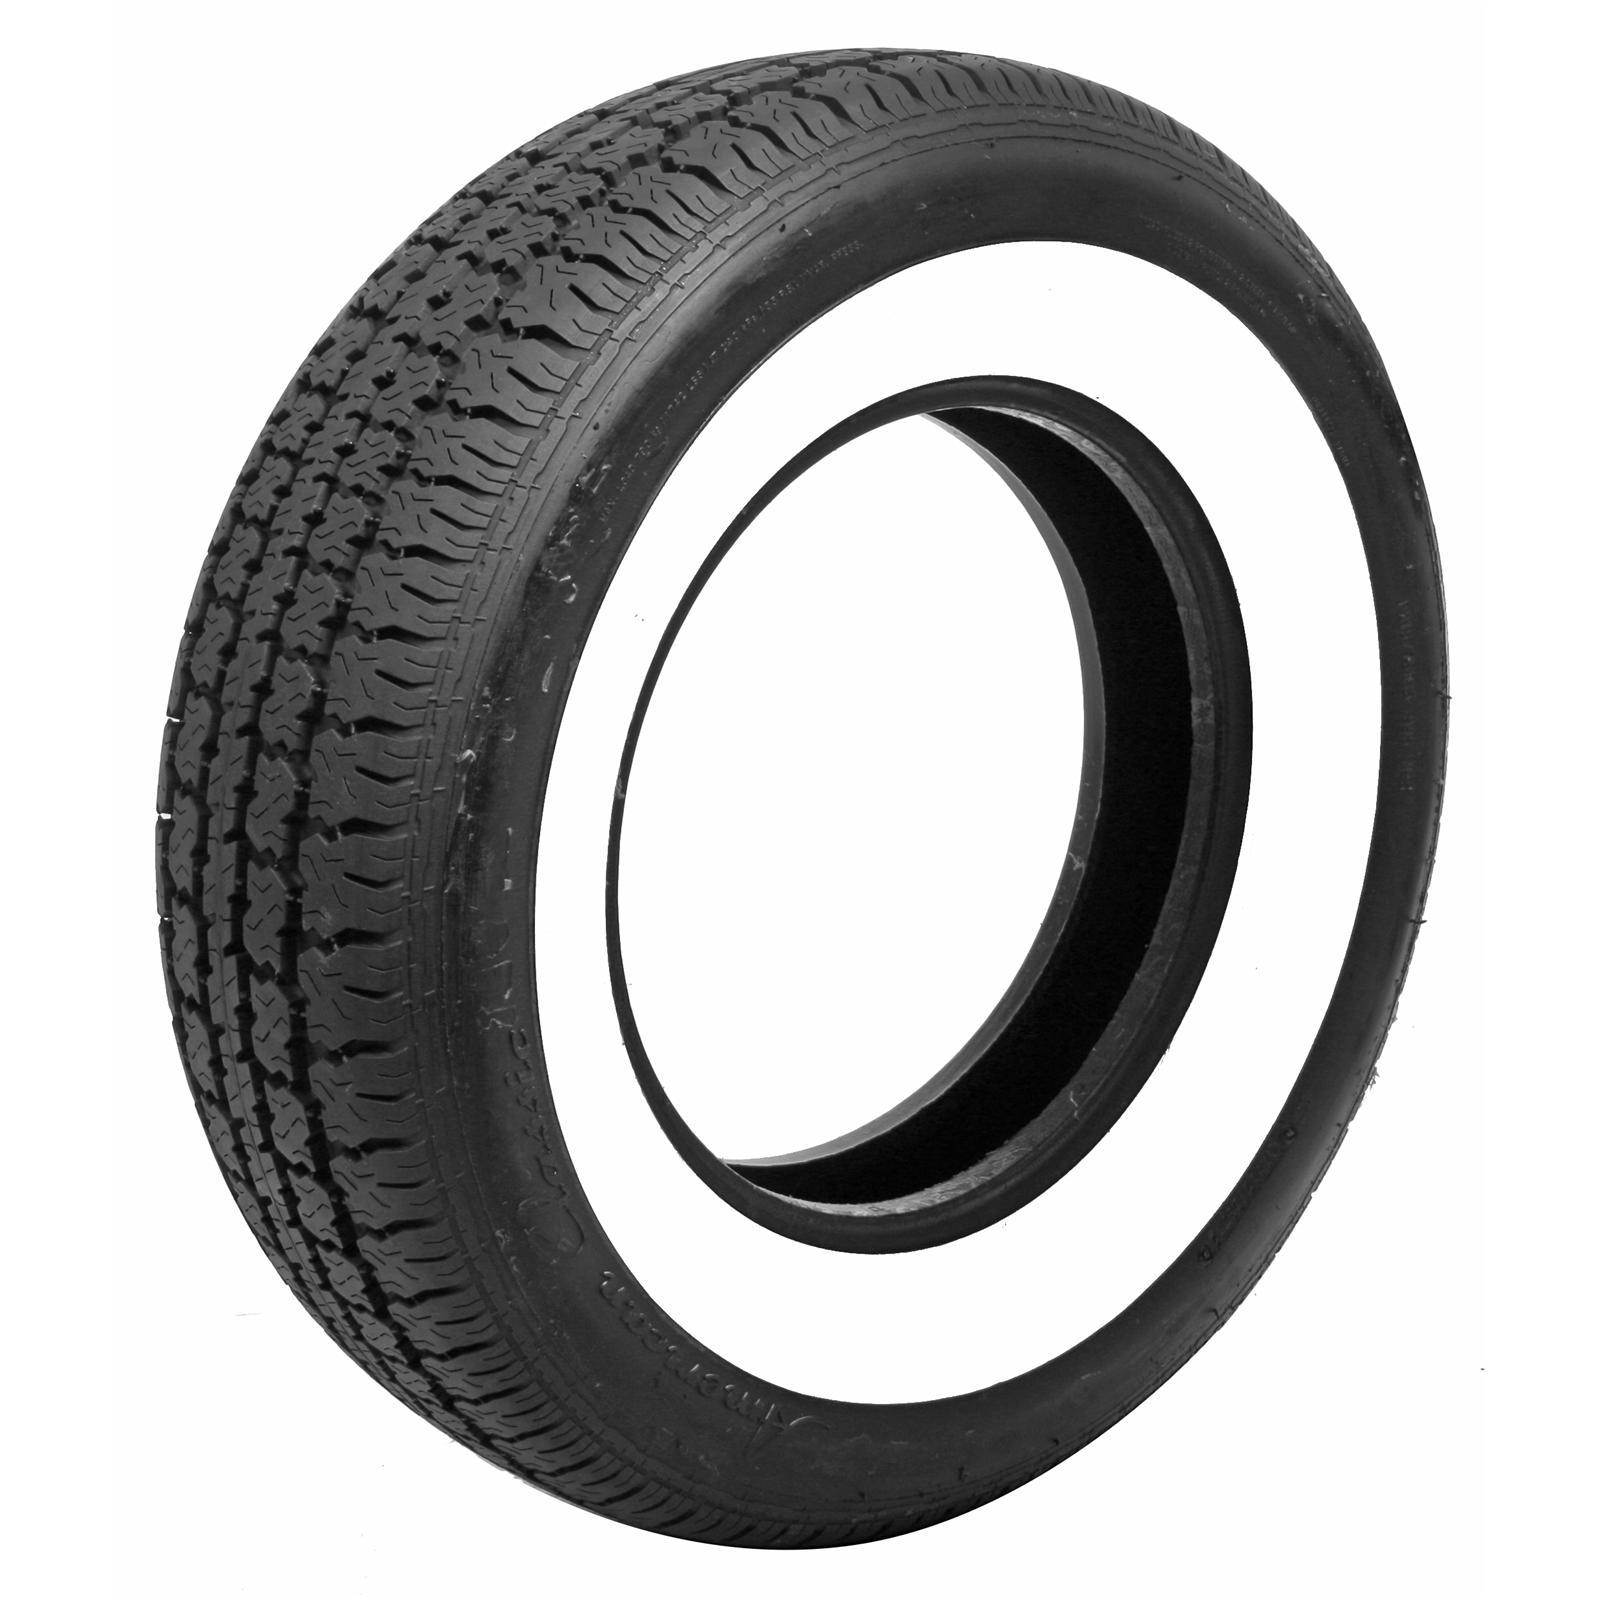 Coker American Classic Collector Radial Tire 215/75-15 ...